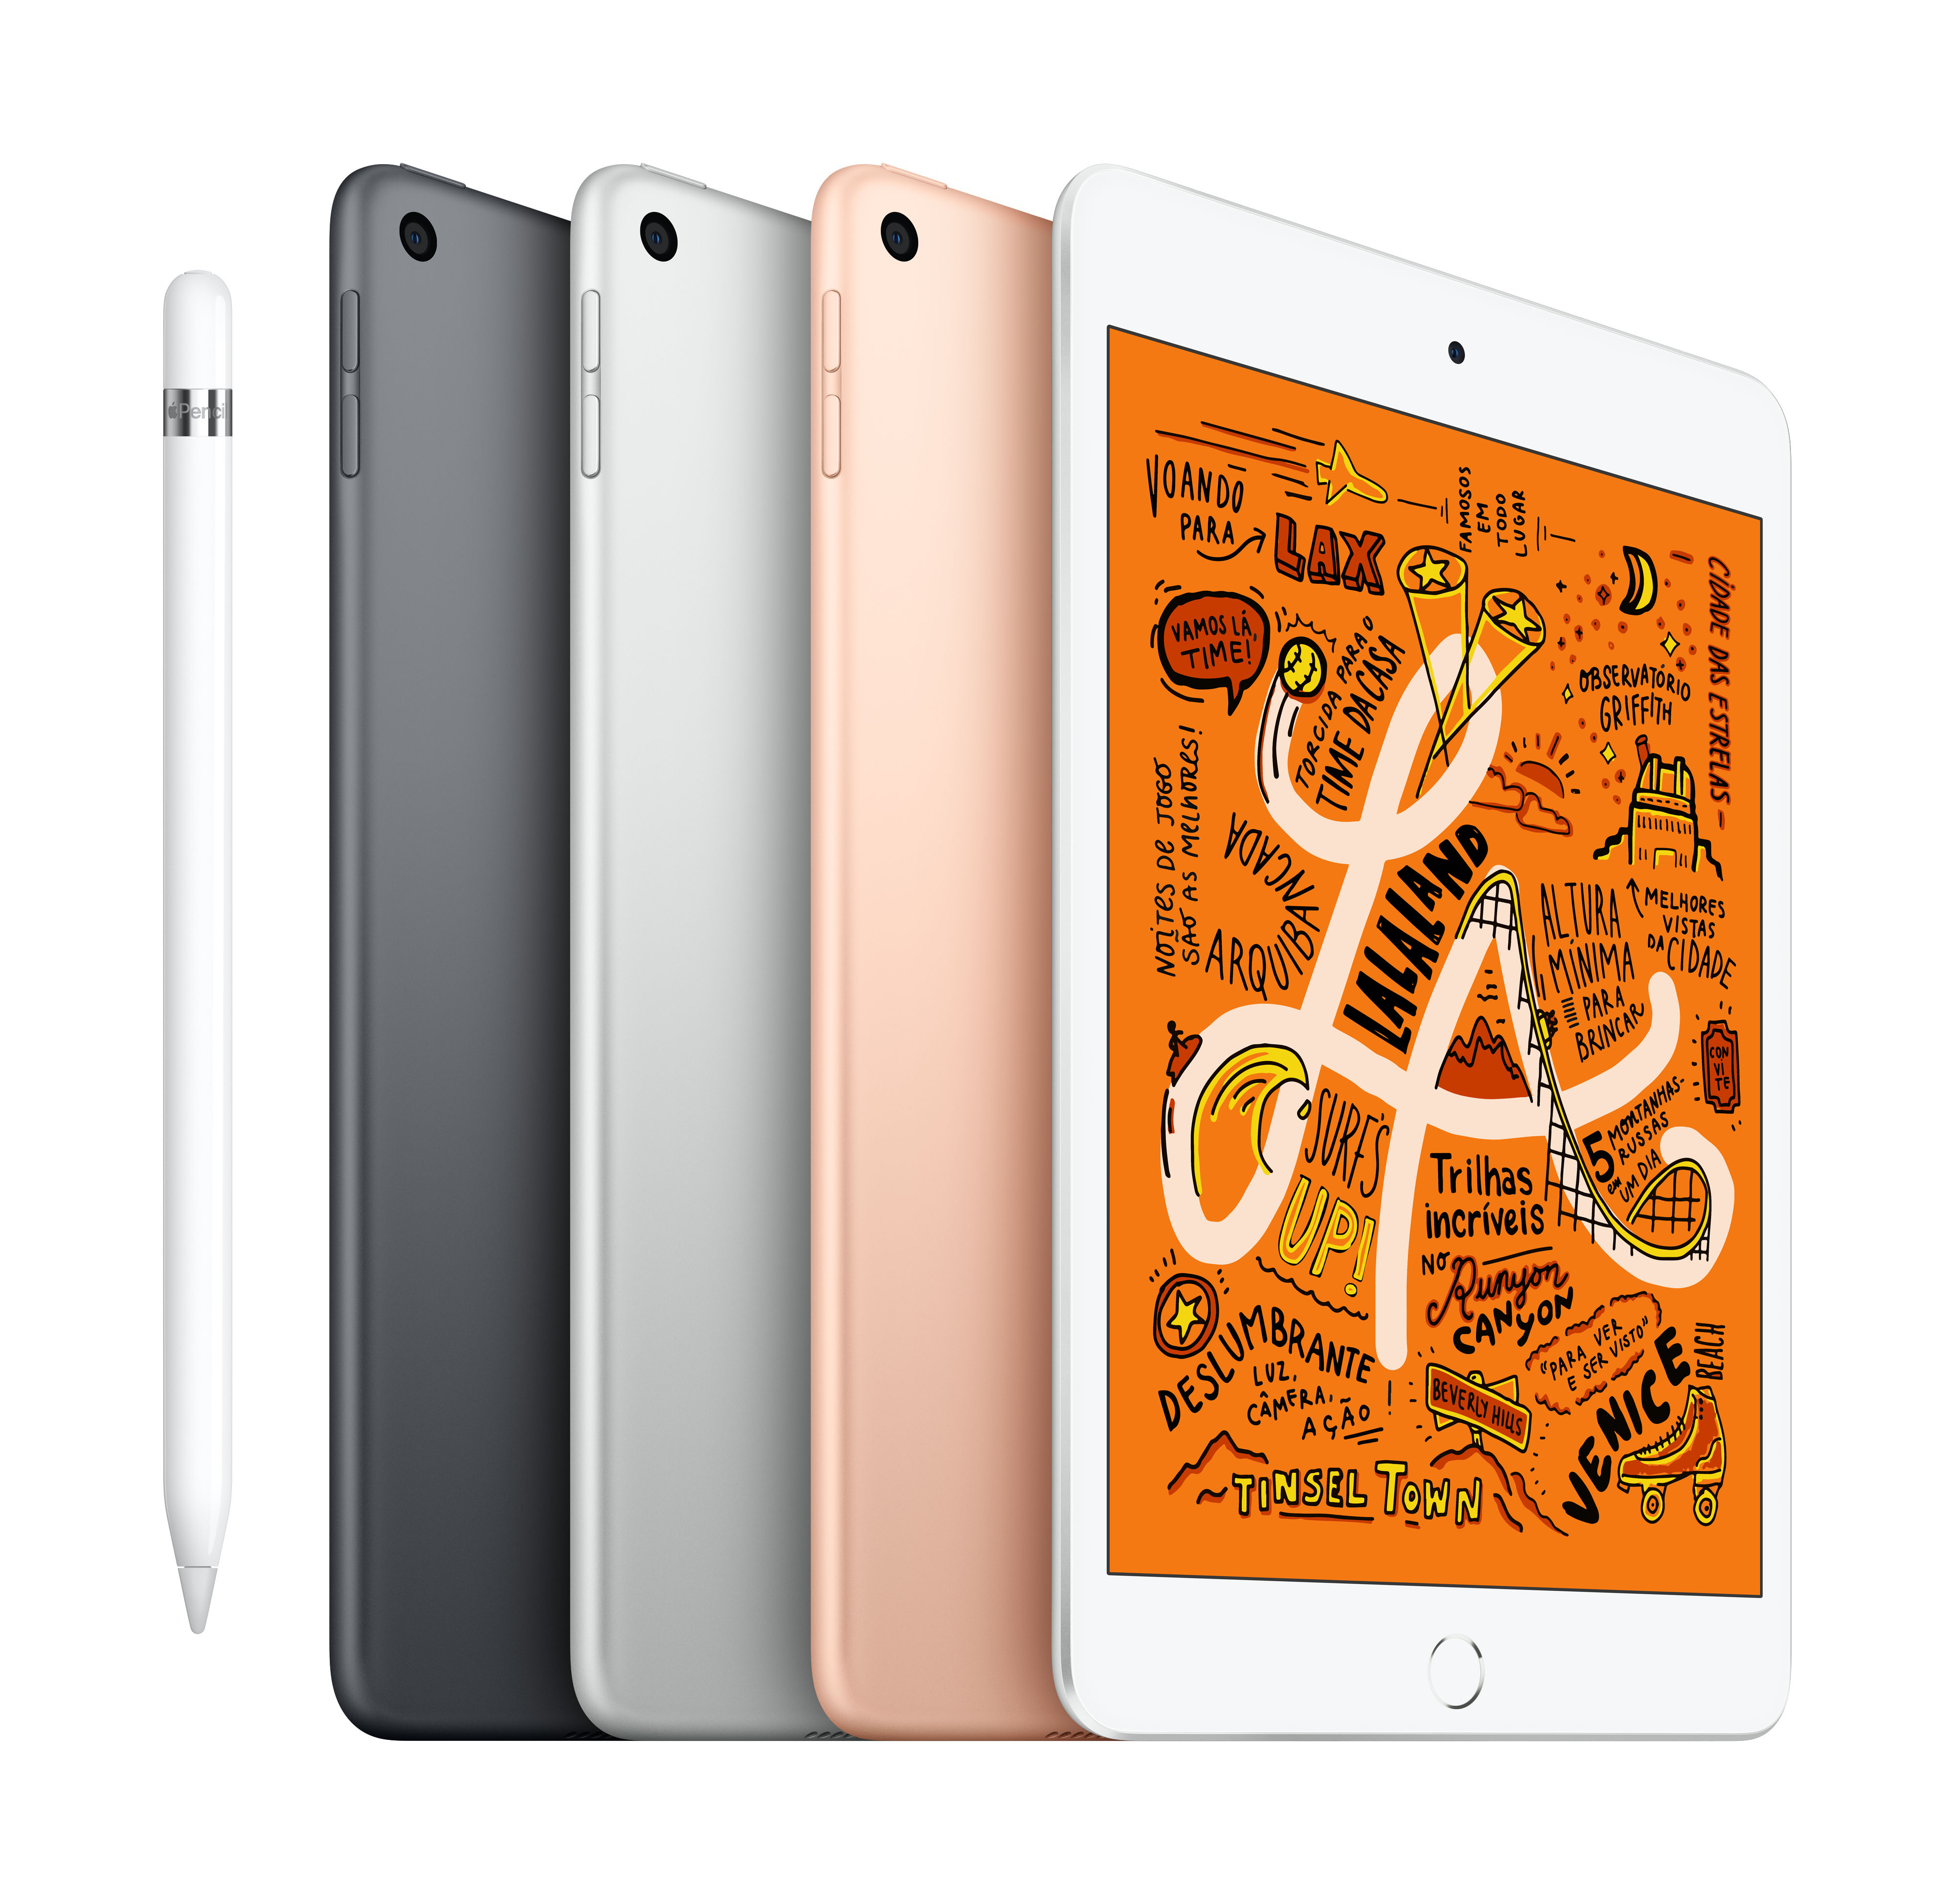 iPad mini. A mightyupgrade.